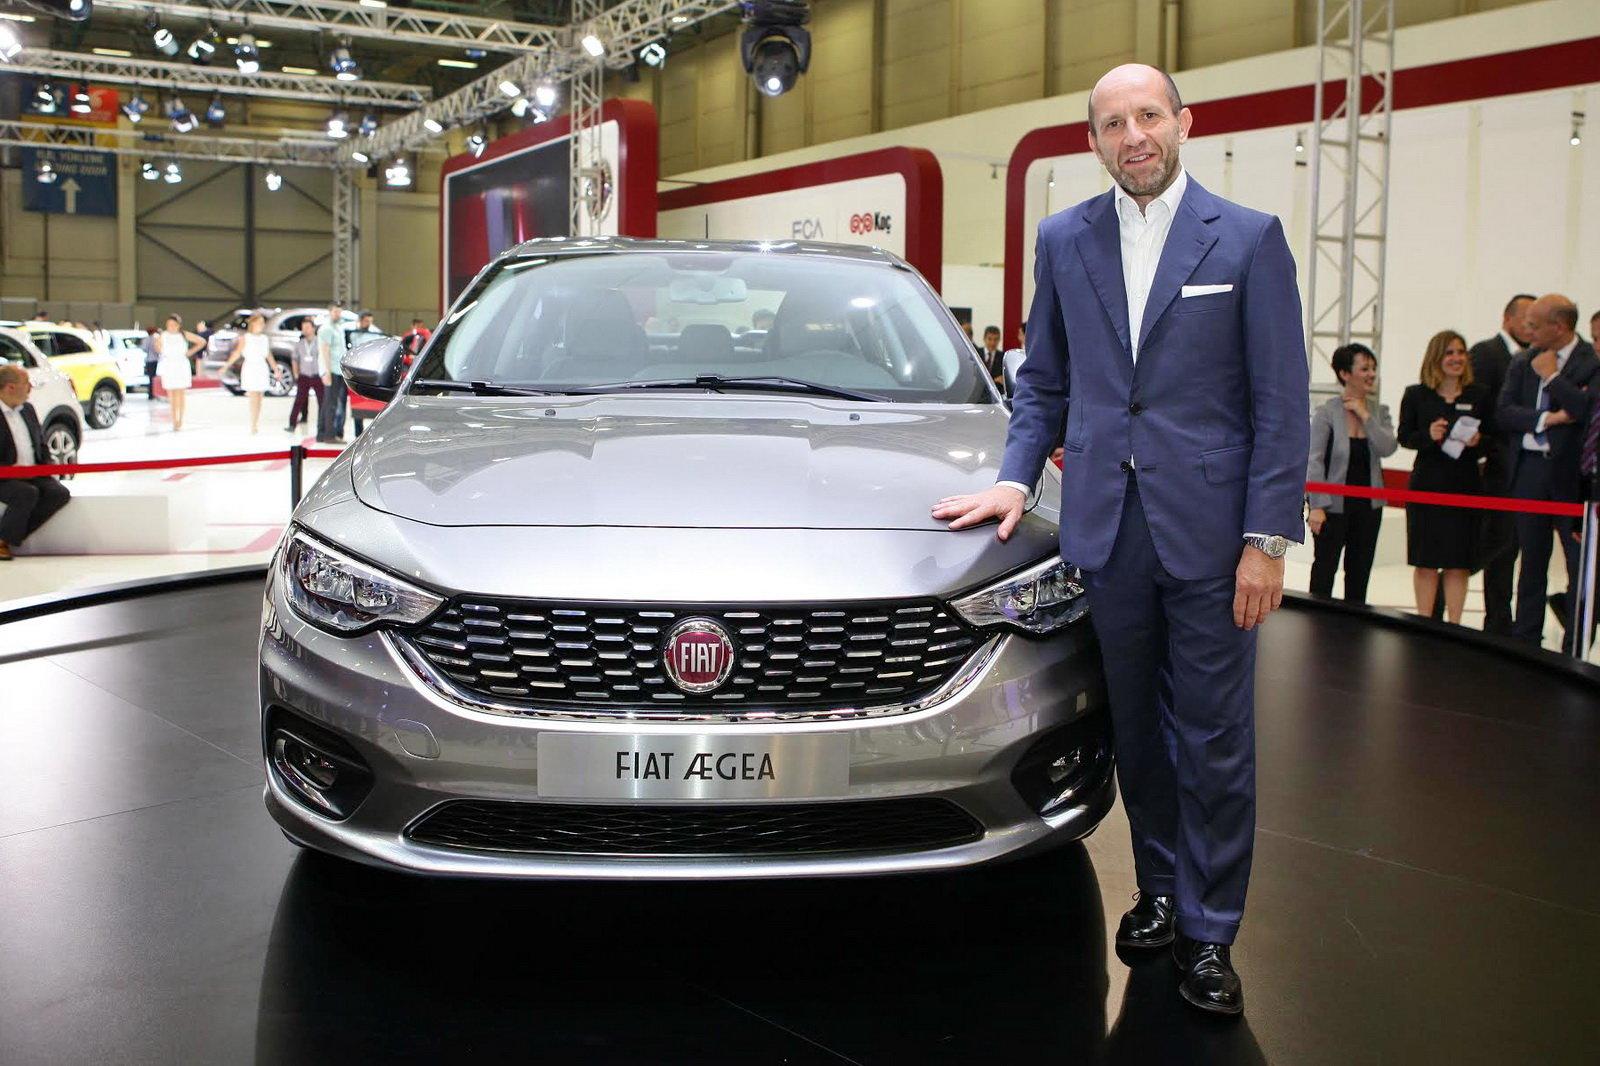 Luca Napolitano, director de la marca FIAT para EMEA.